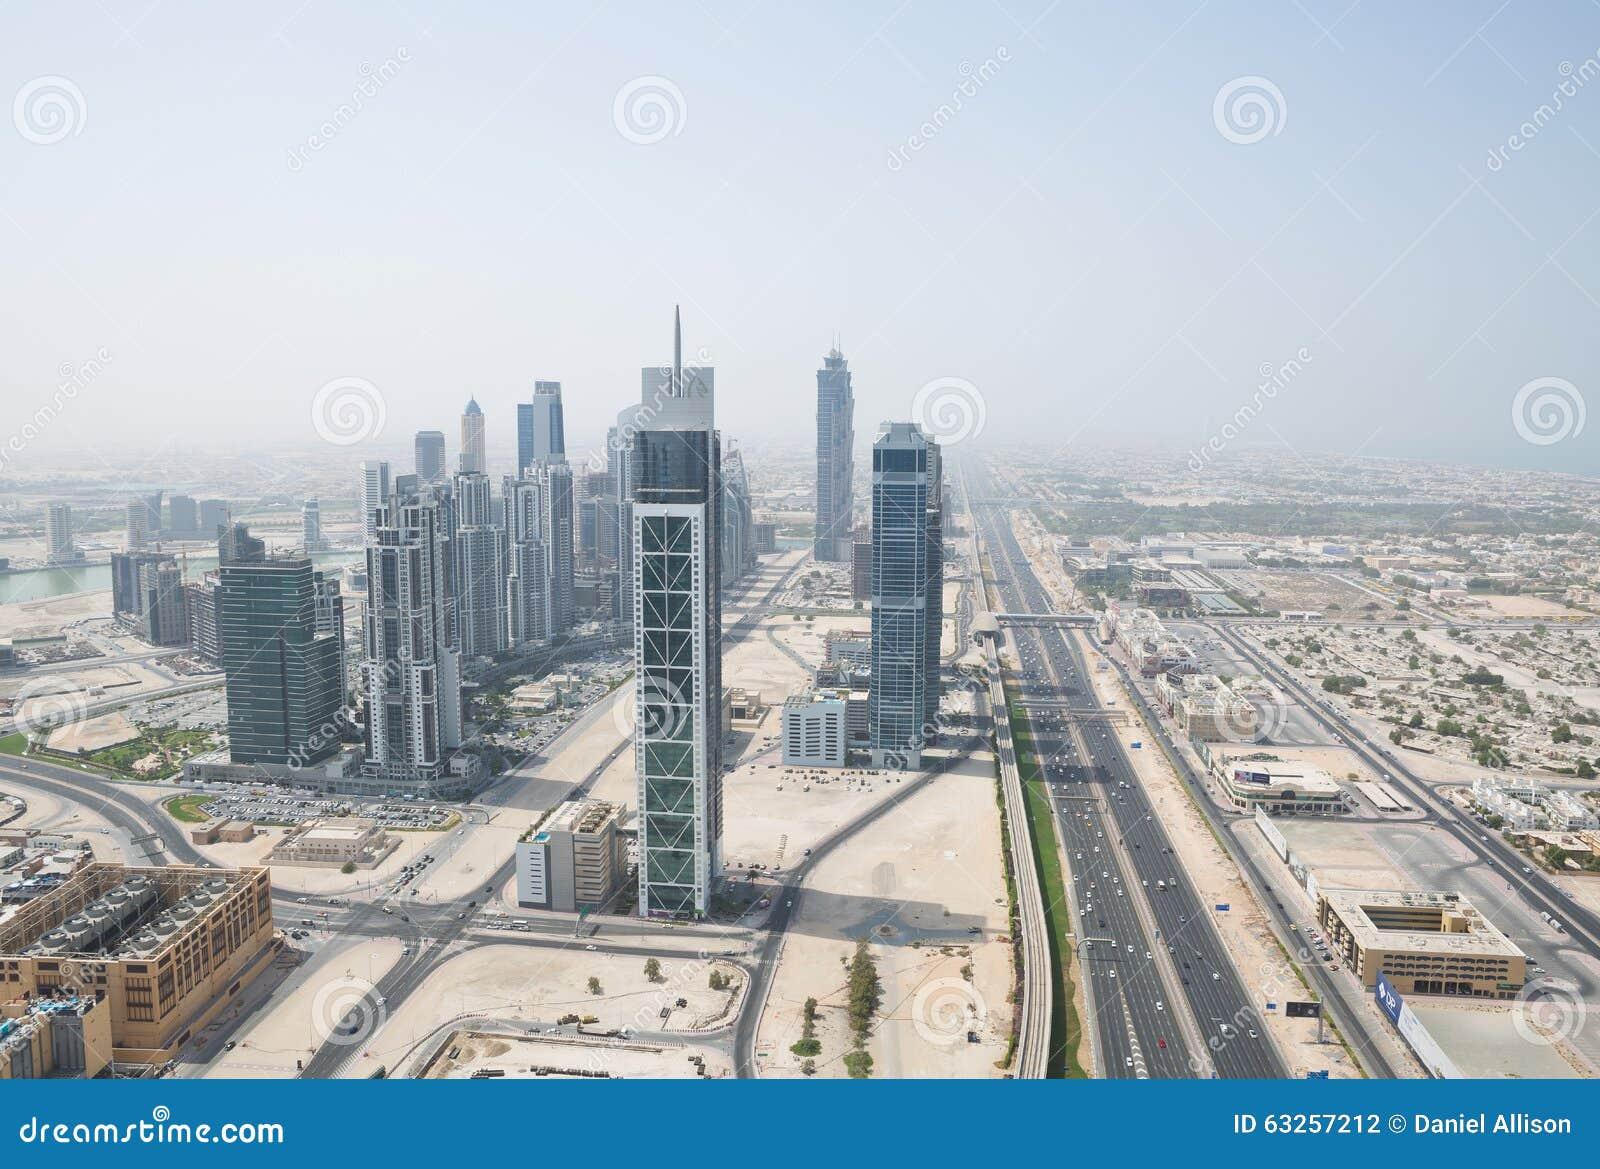 Al hikma development company uae